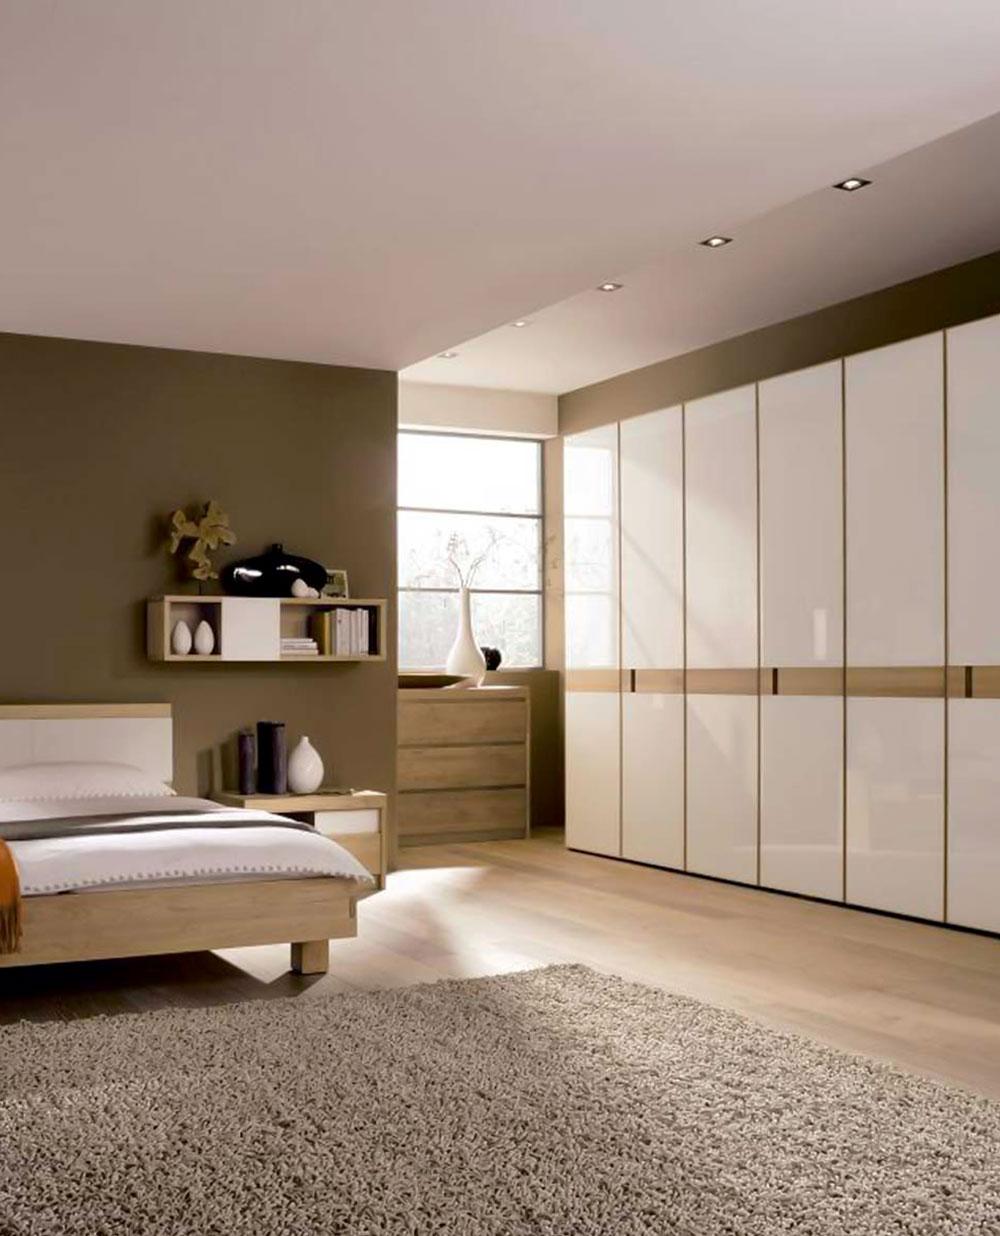 decorasion bedroom design6 - نکاتی در مورد تزیین اتاق خواب